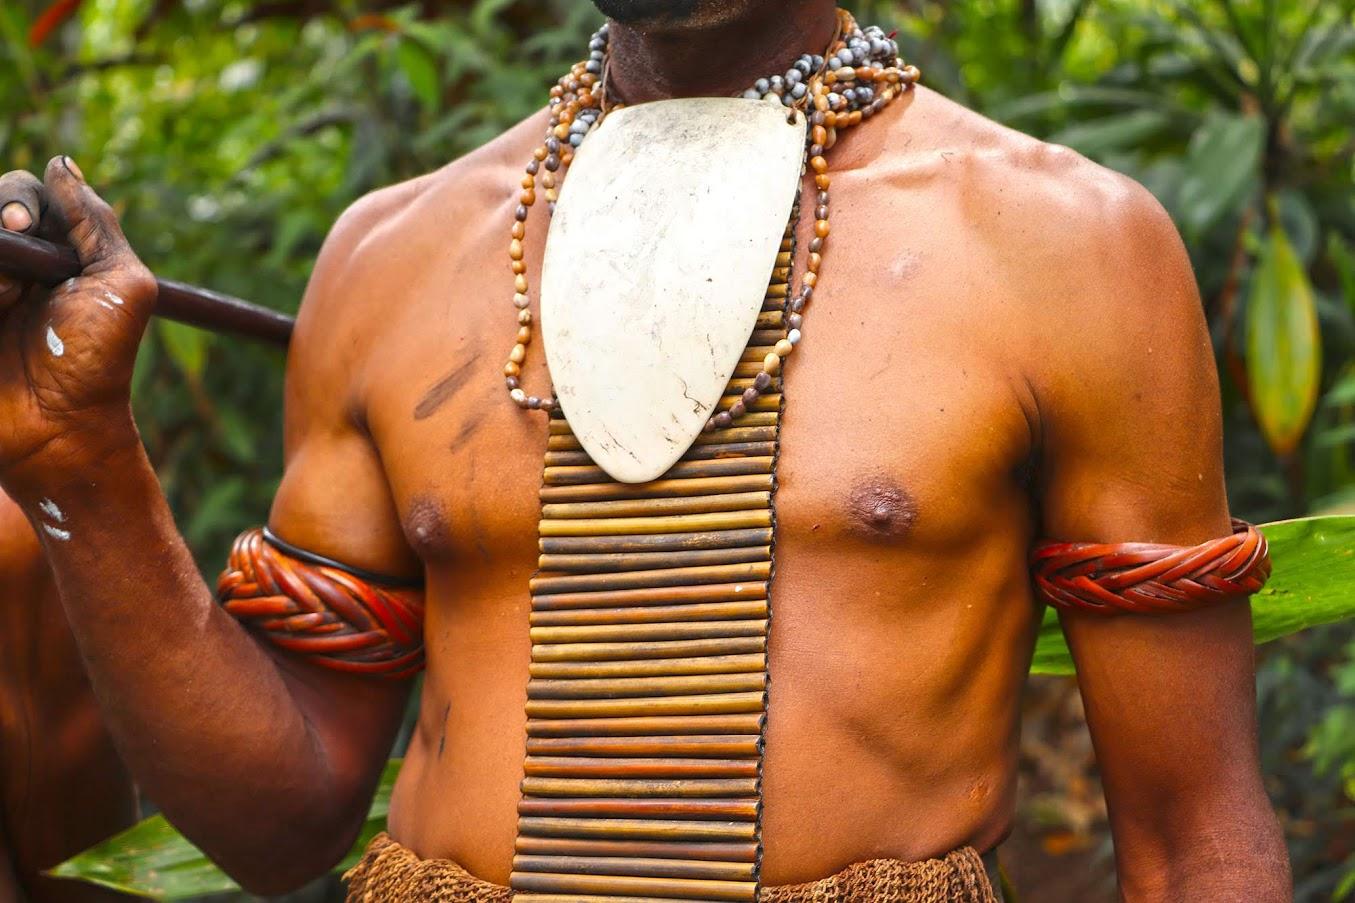 Dias 149 e 151 - As TRIBOS DE MOUNT HAGEN, os Huli Wigmen e os Hagen Wigmen | Papua Nova Guiné